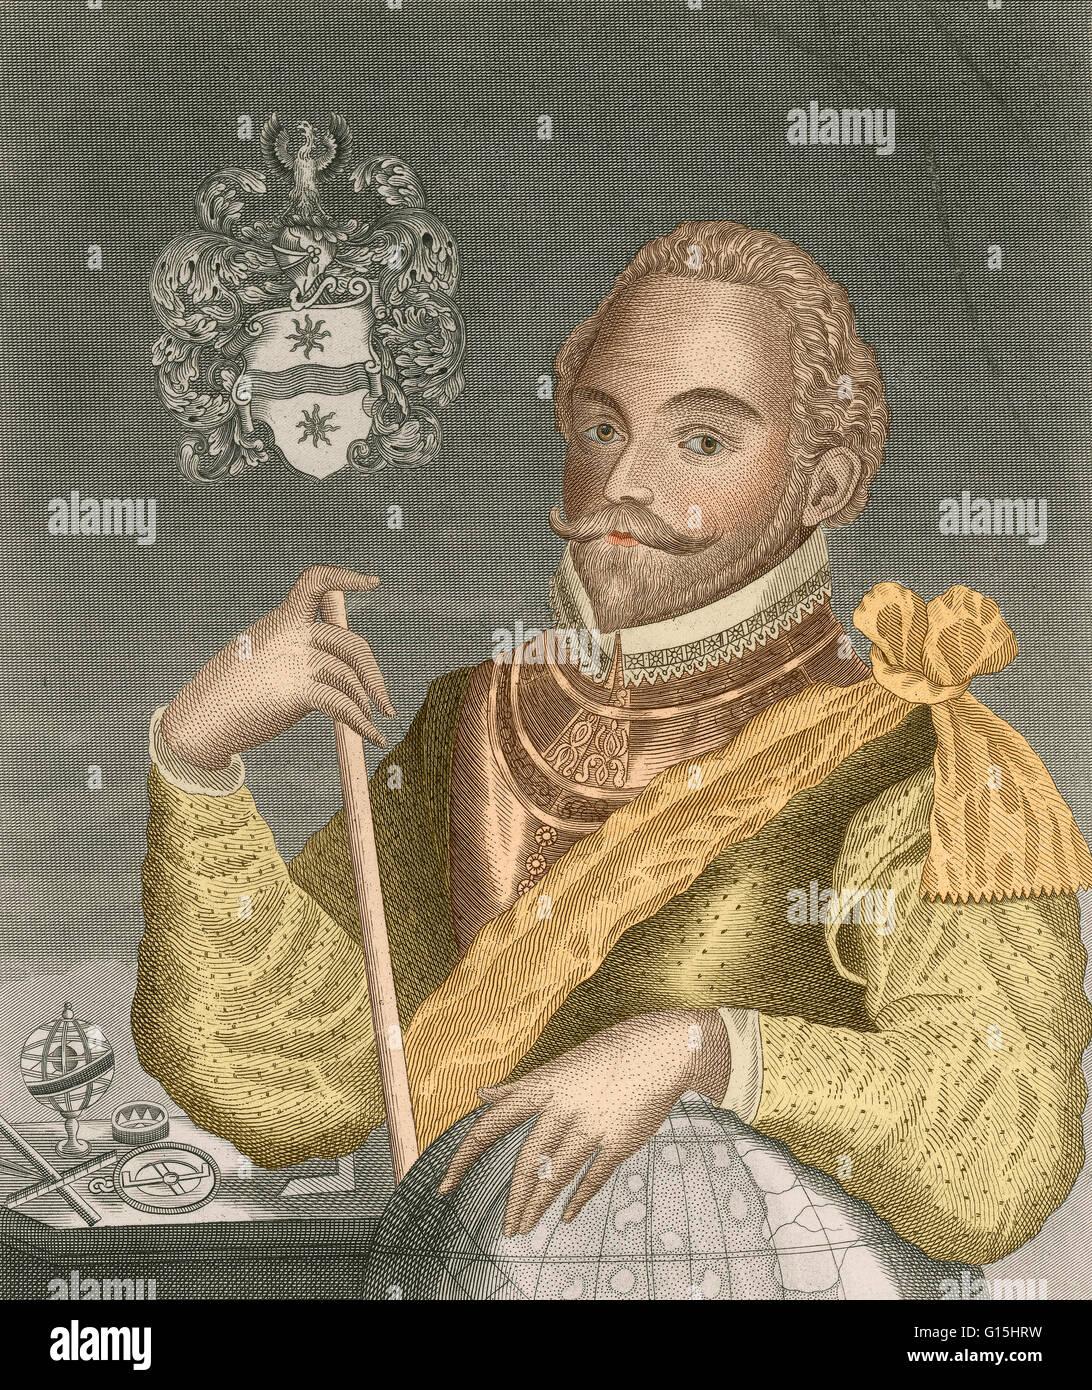 Sir Francis Drake, Vice Admiral (1540-1596) was an English sea captain, privateer, navigator, slaver, explorer and - Stock Image